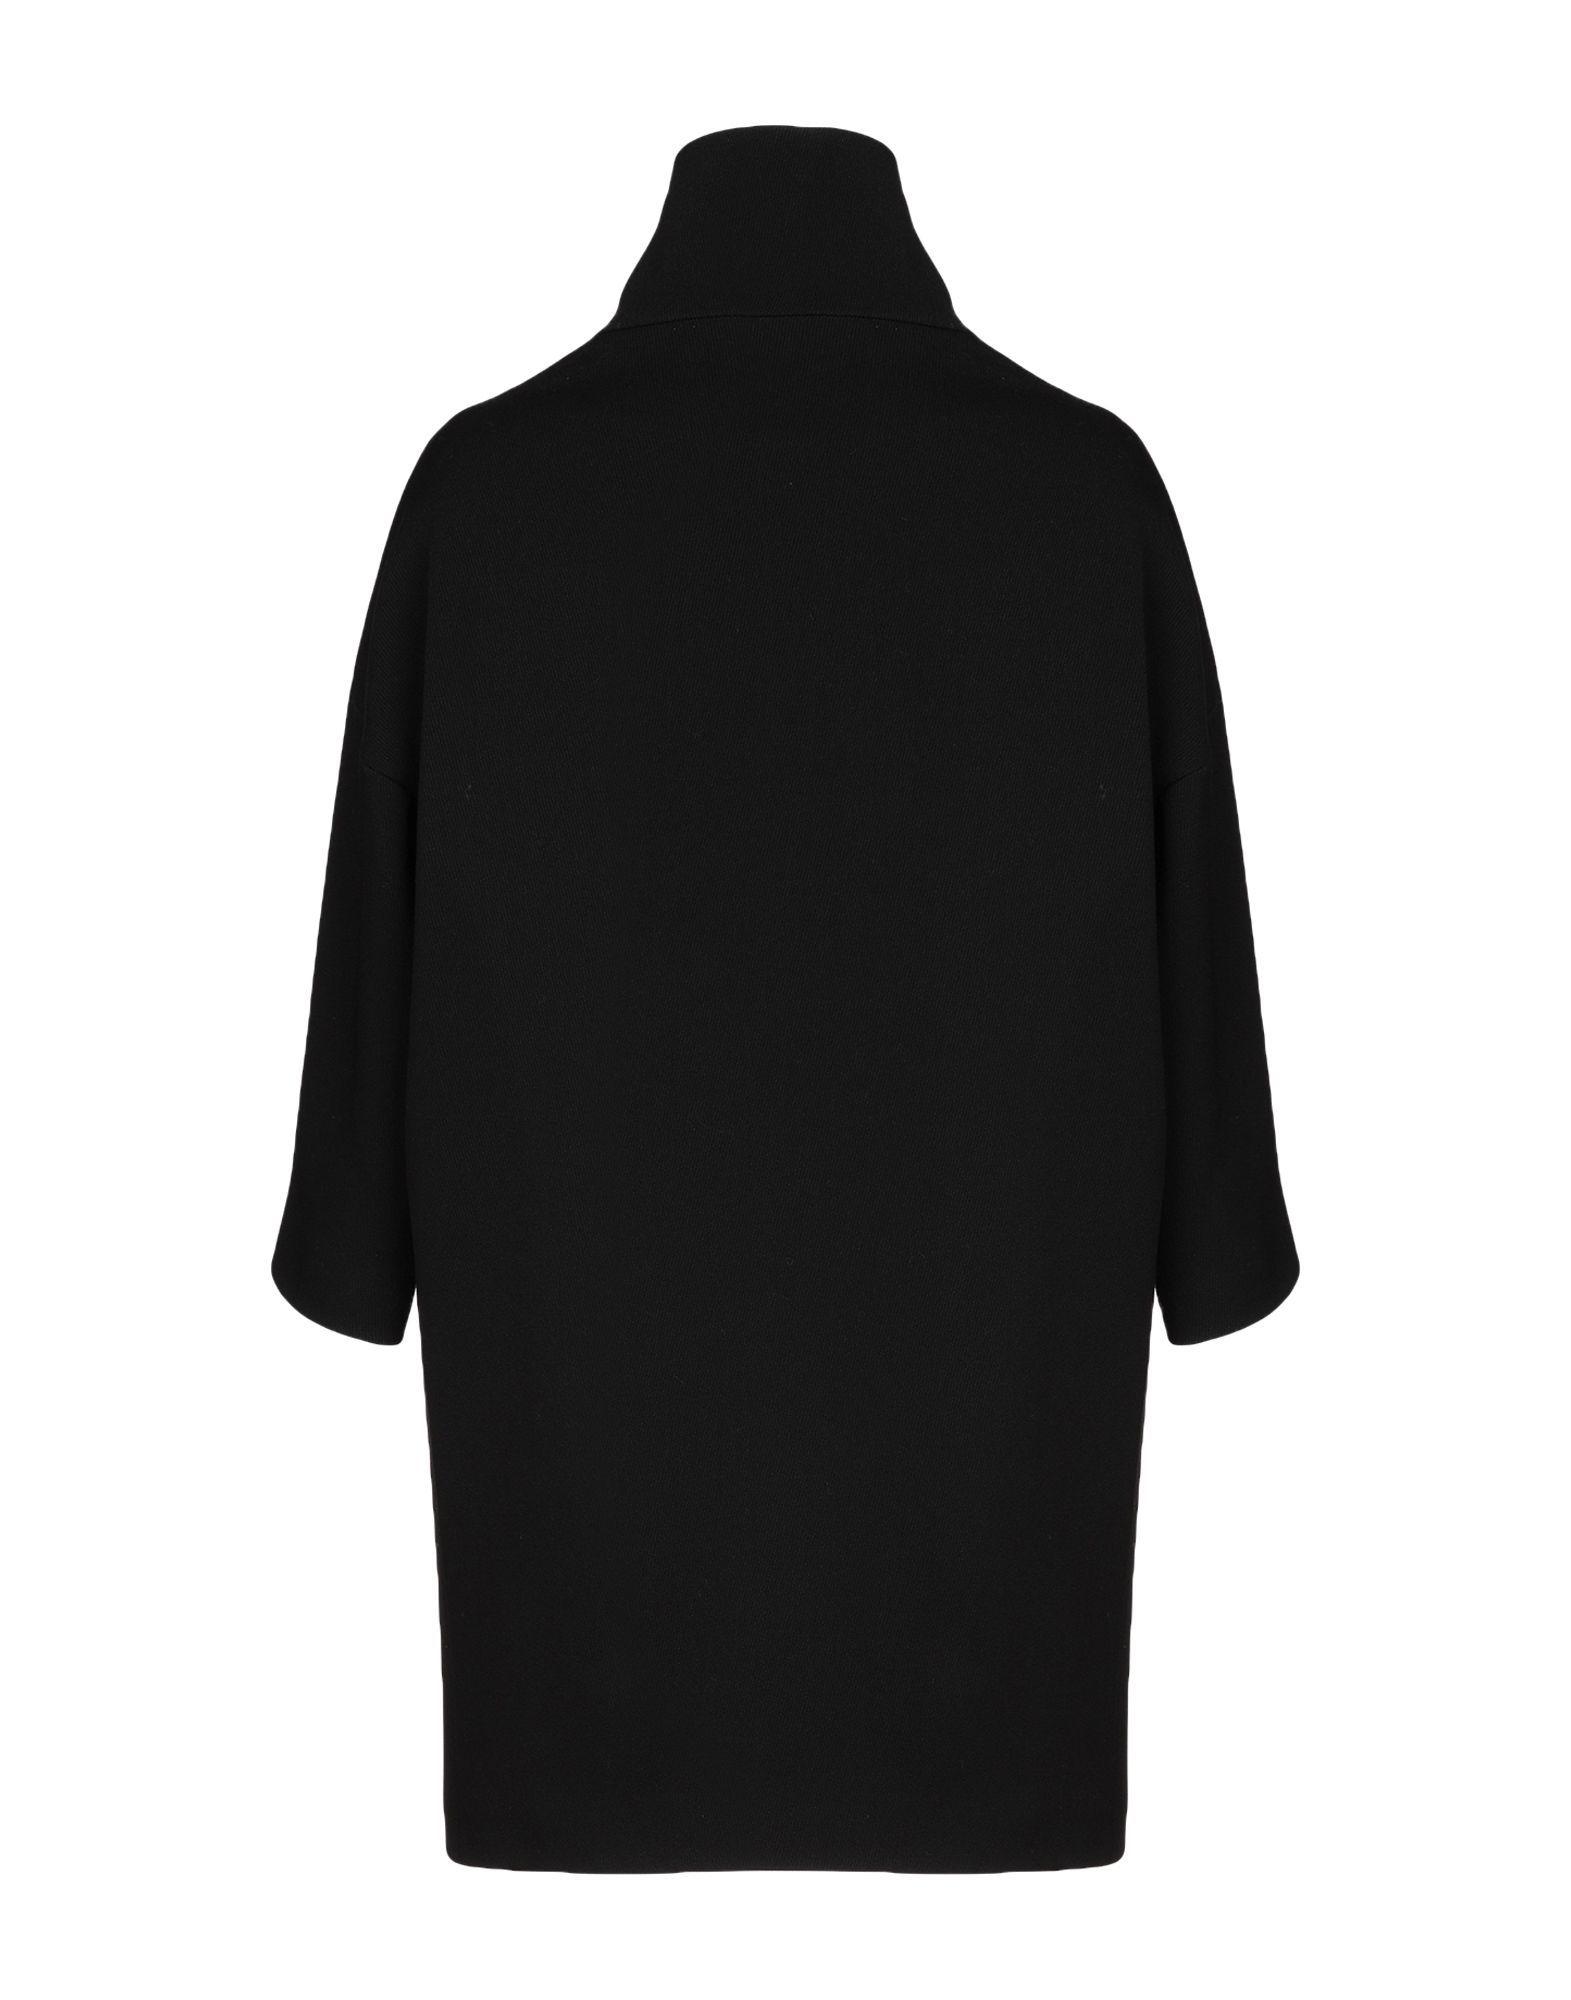 Coat & Jackets Annie P. Black Women's Virgin Wool